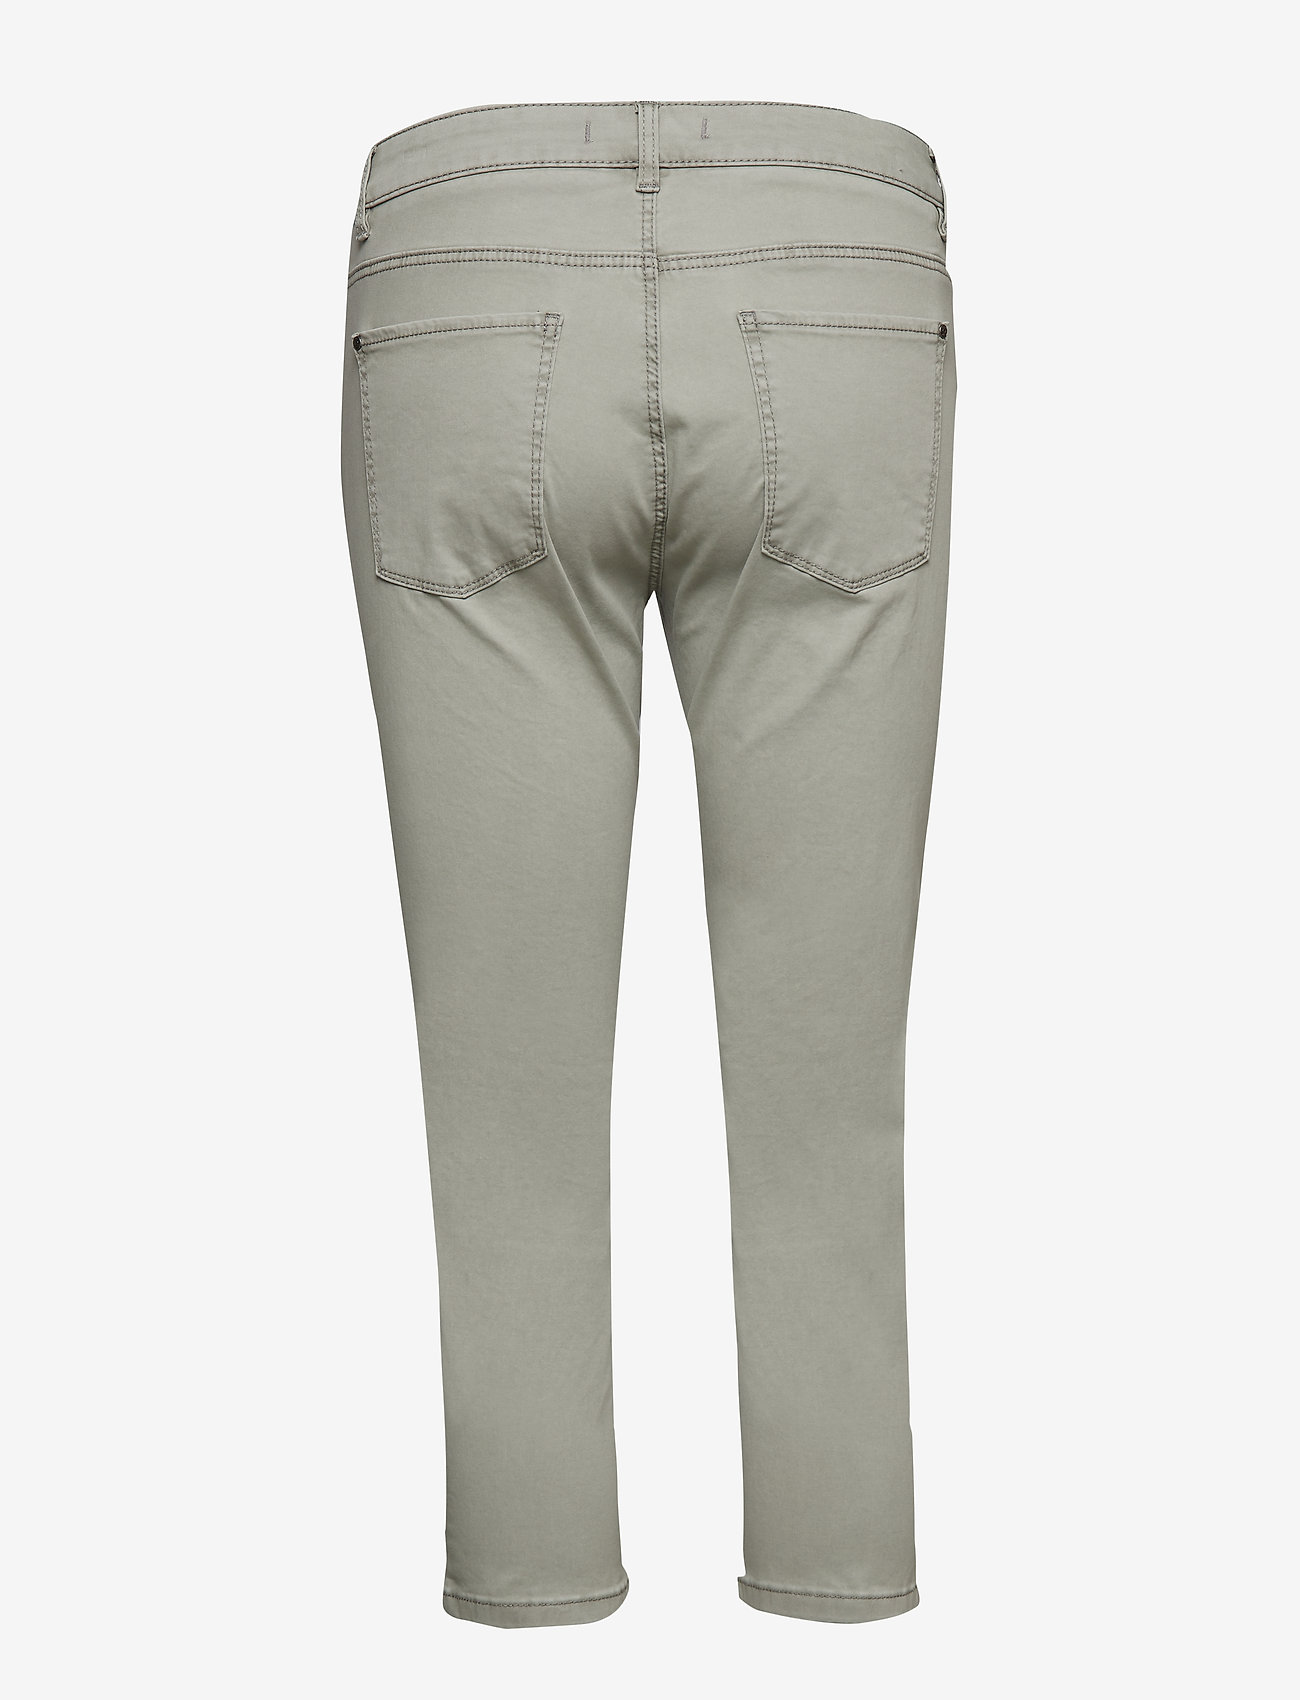 Esprit Casual - Pants woven - casual bukser - light grey - 1